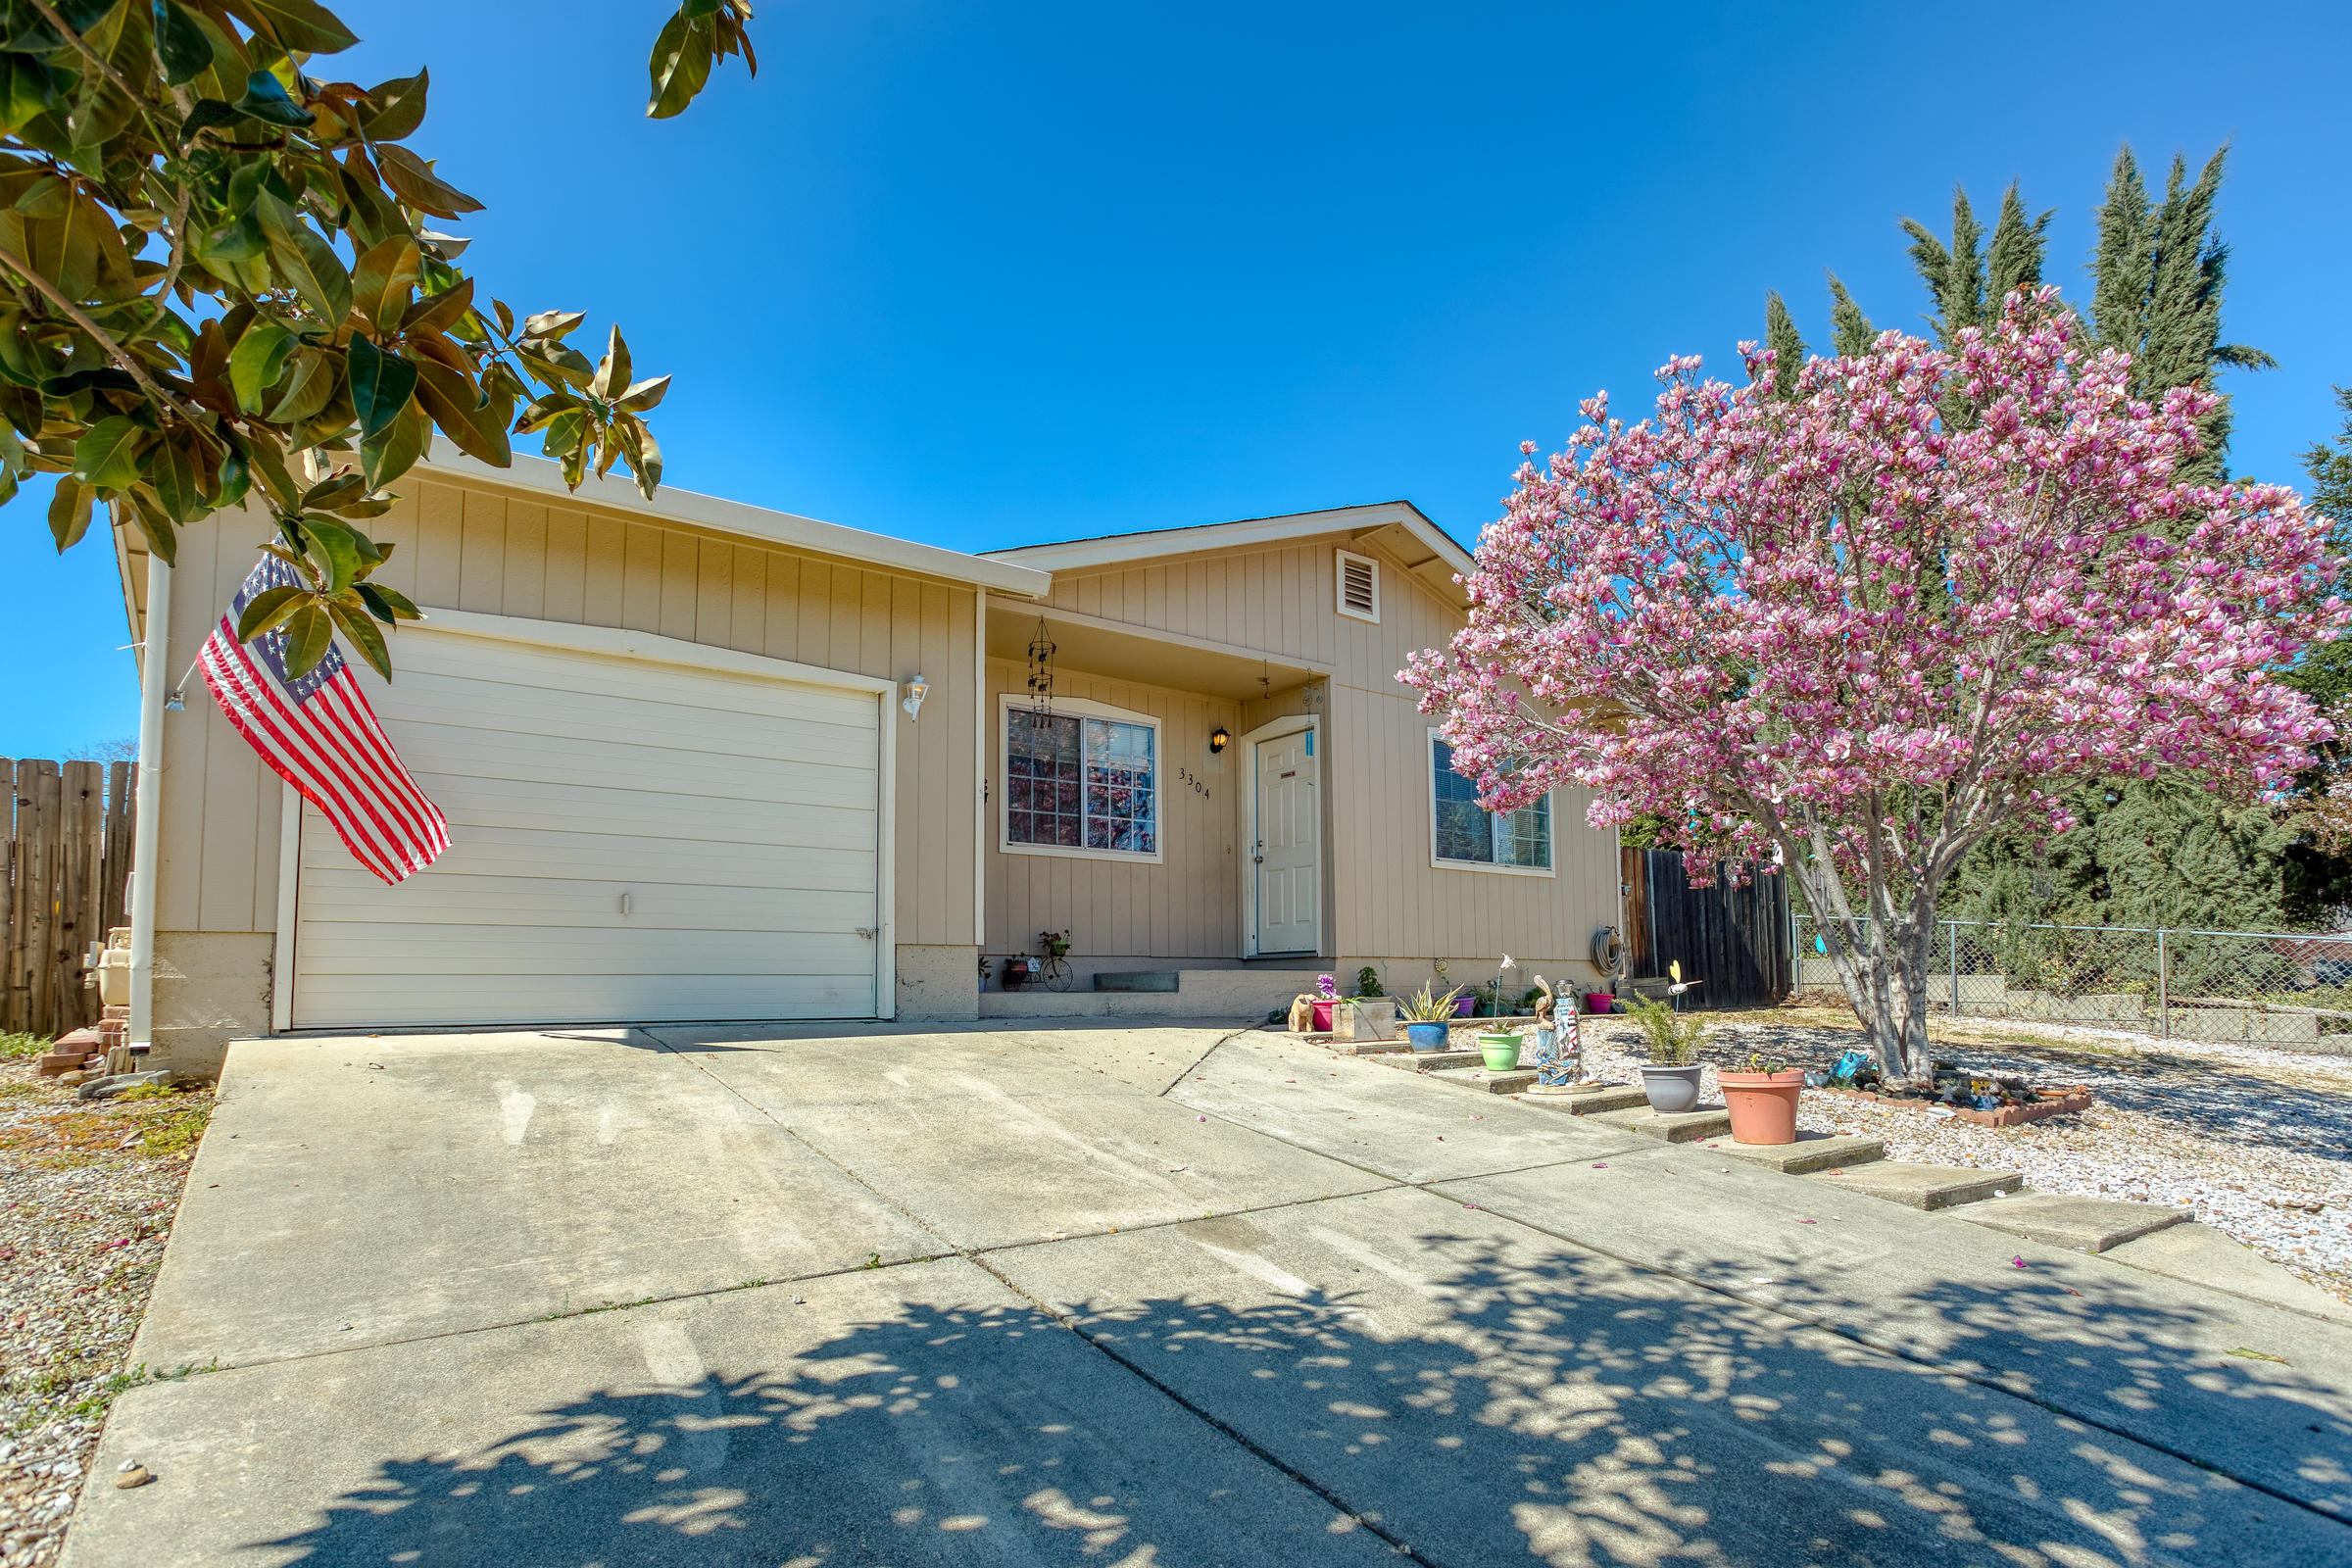 3304 Foothill Vista Dr, Cottonwood, CA 96022